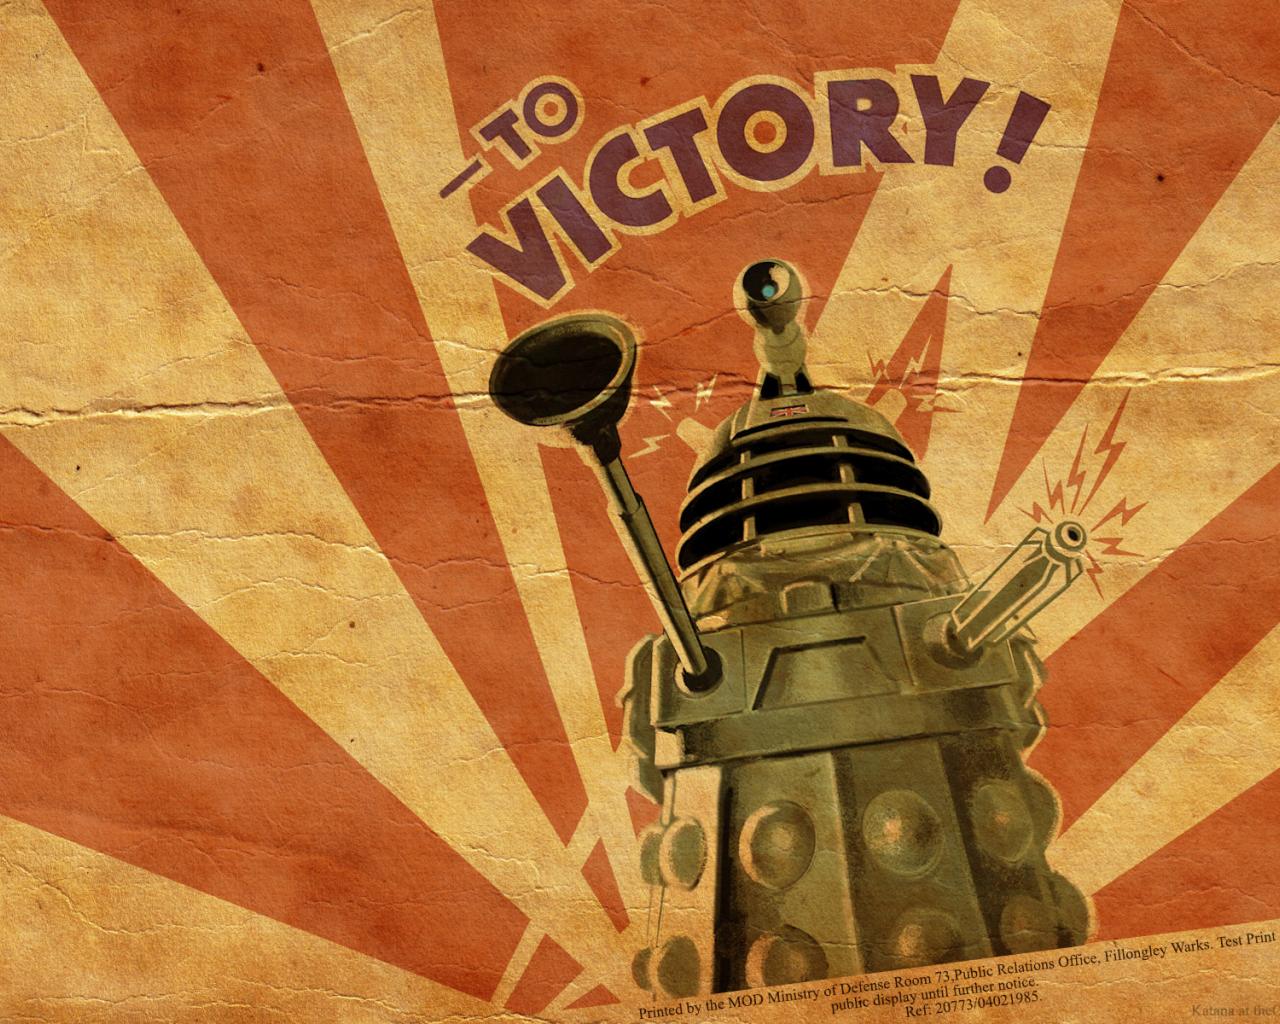 Free Download Dalek Propaganda Wallpaper 1920x1200 Dalek Propaganda Doctor Who 1920x1200 For Your Desktop Mobile Tablet Explore 48 Star Wars Propaganda Wallpaper Star Wars Propaganda Wallpaper Star Wars Star